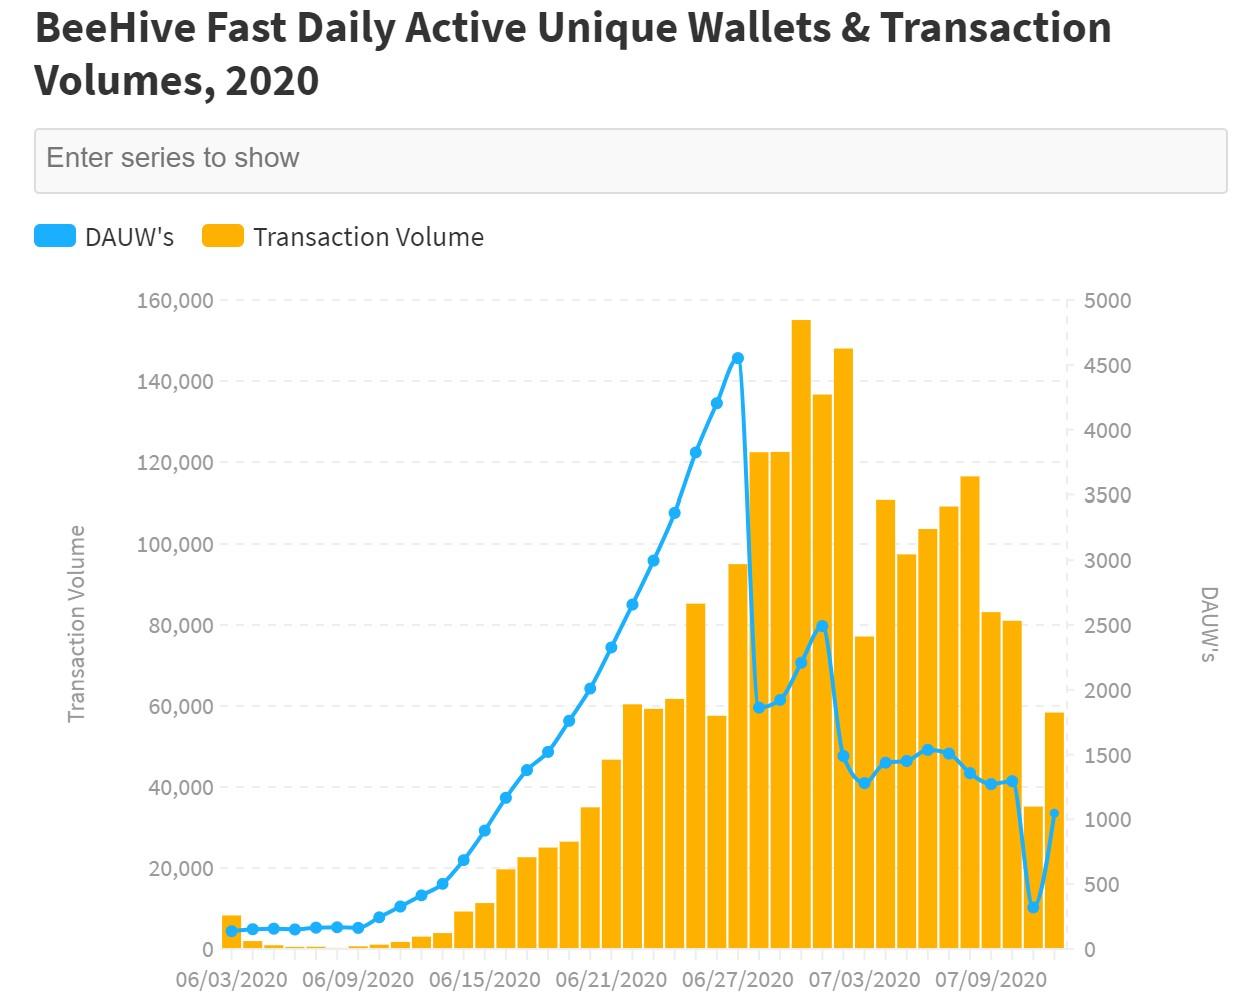 BeeHive Fast每日活跃钱包总量与交易量分析图